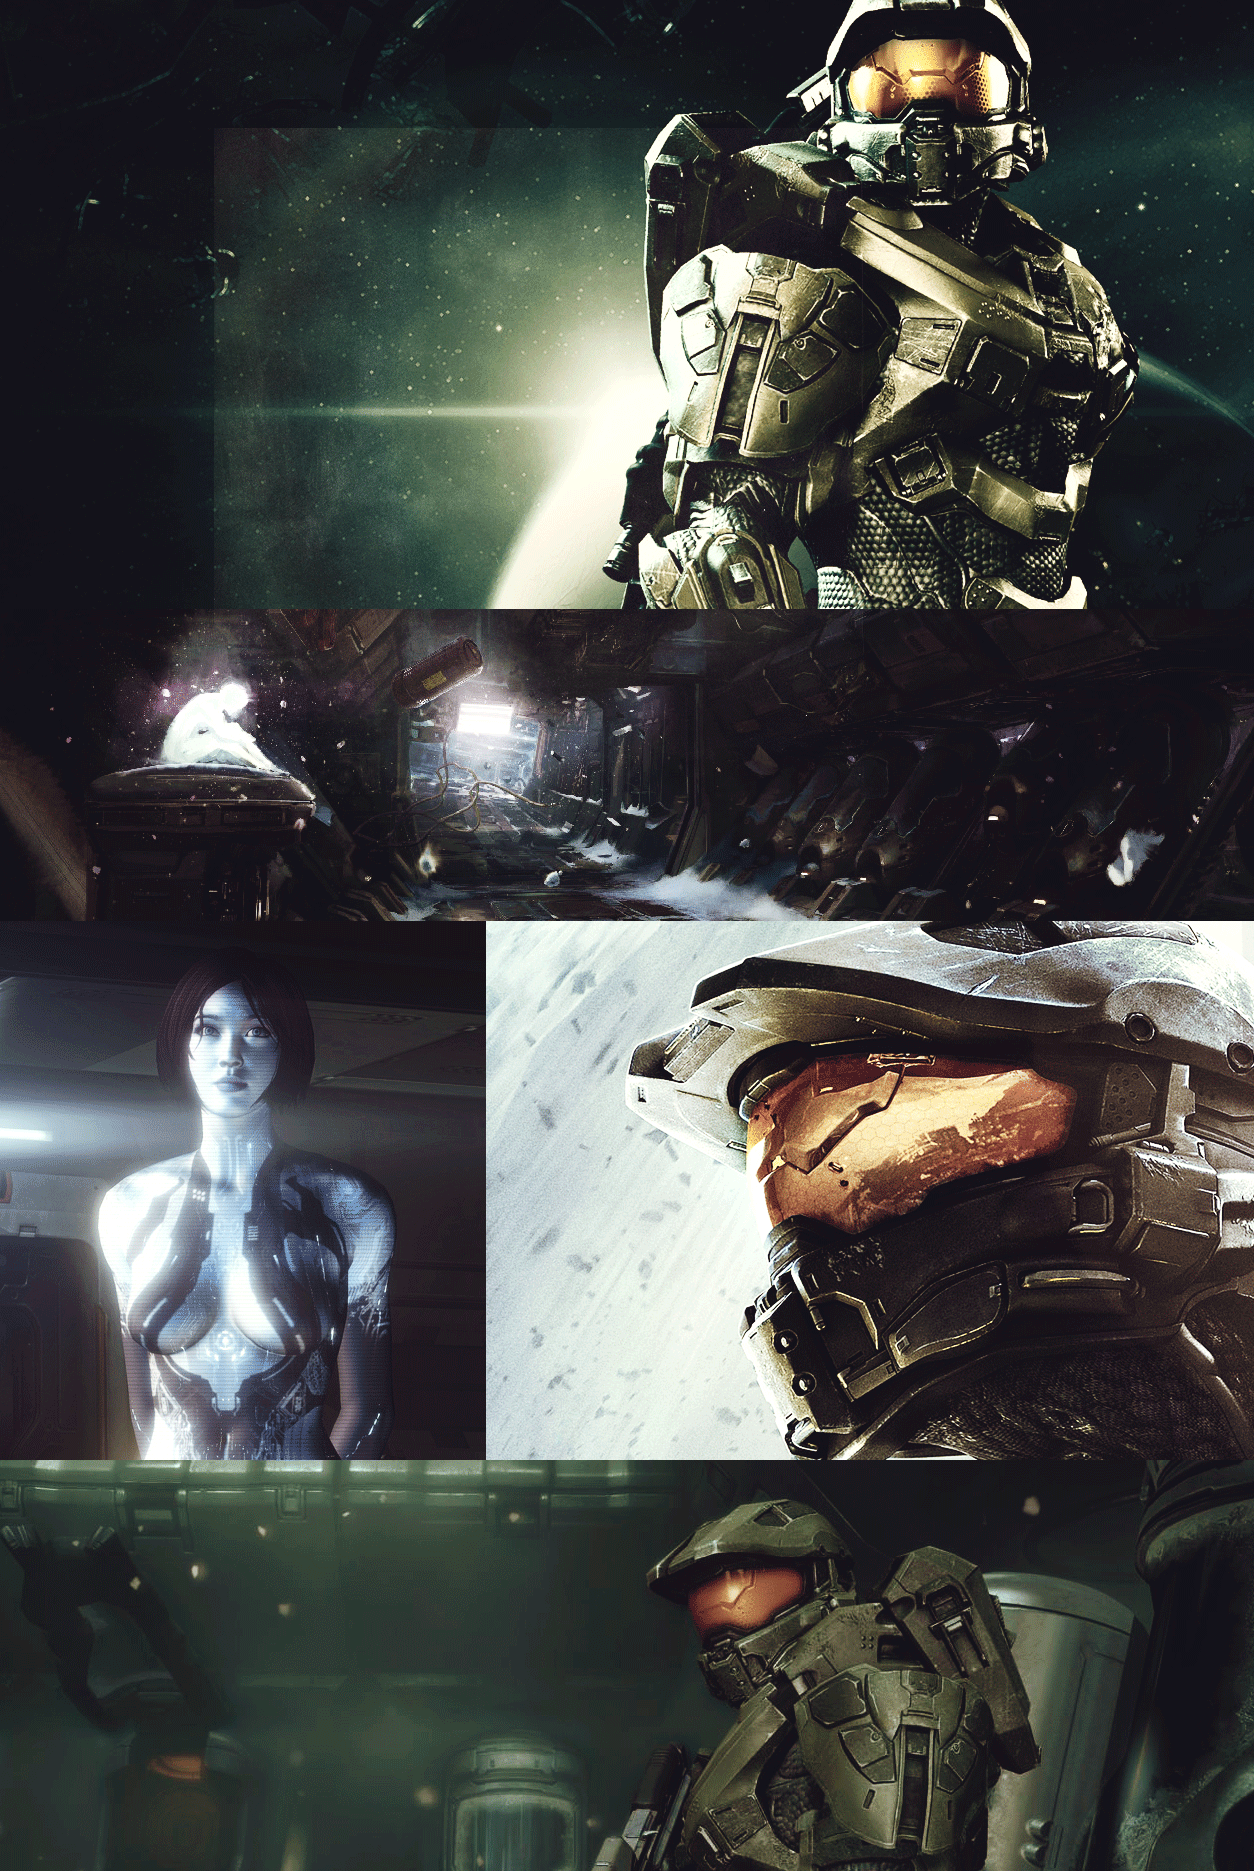 Halo 4 Halo 4, Halo, Gears of war